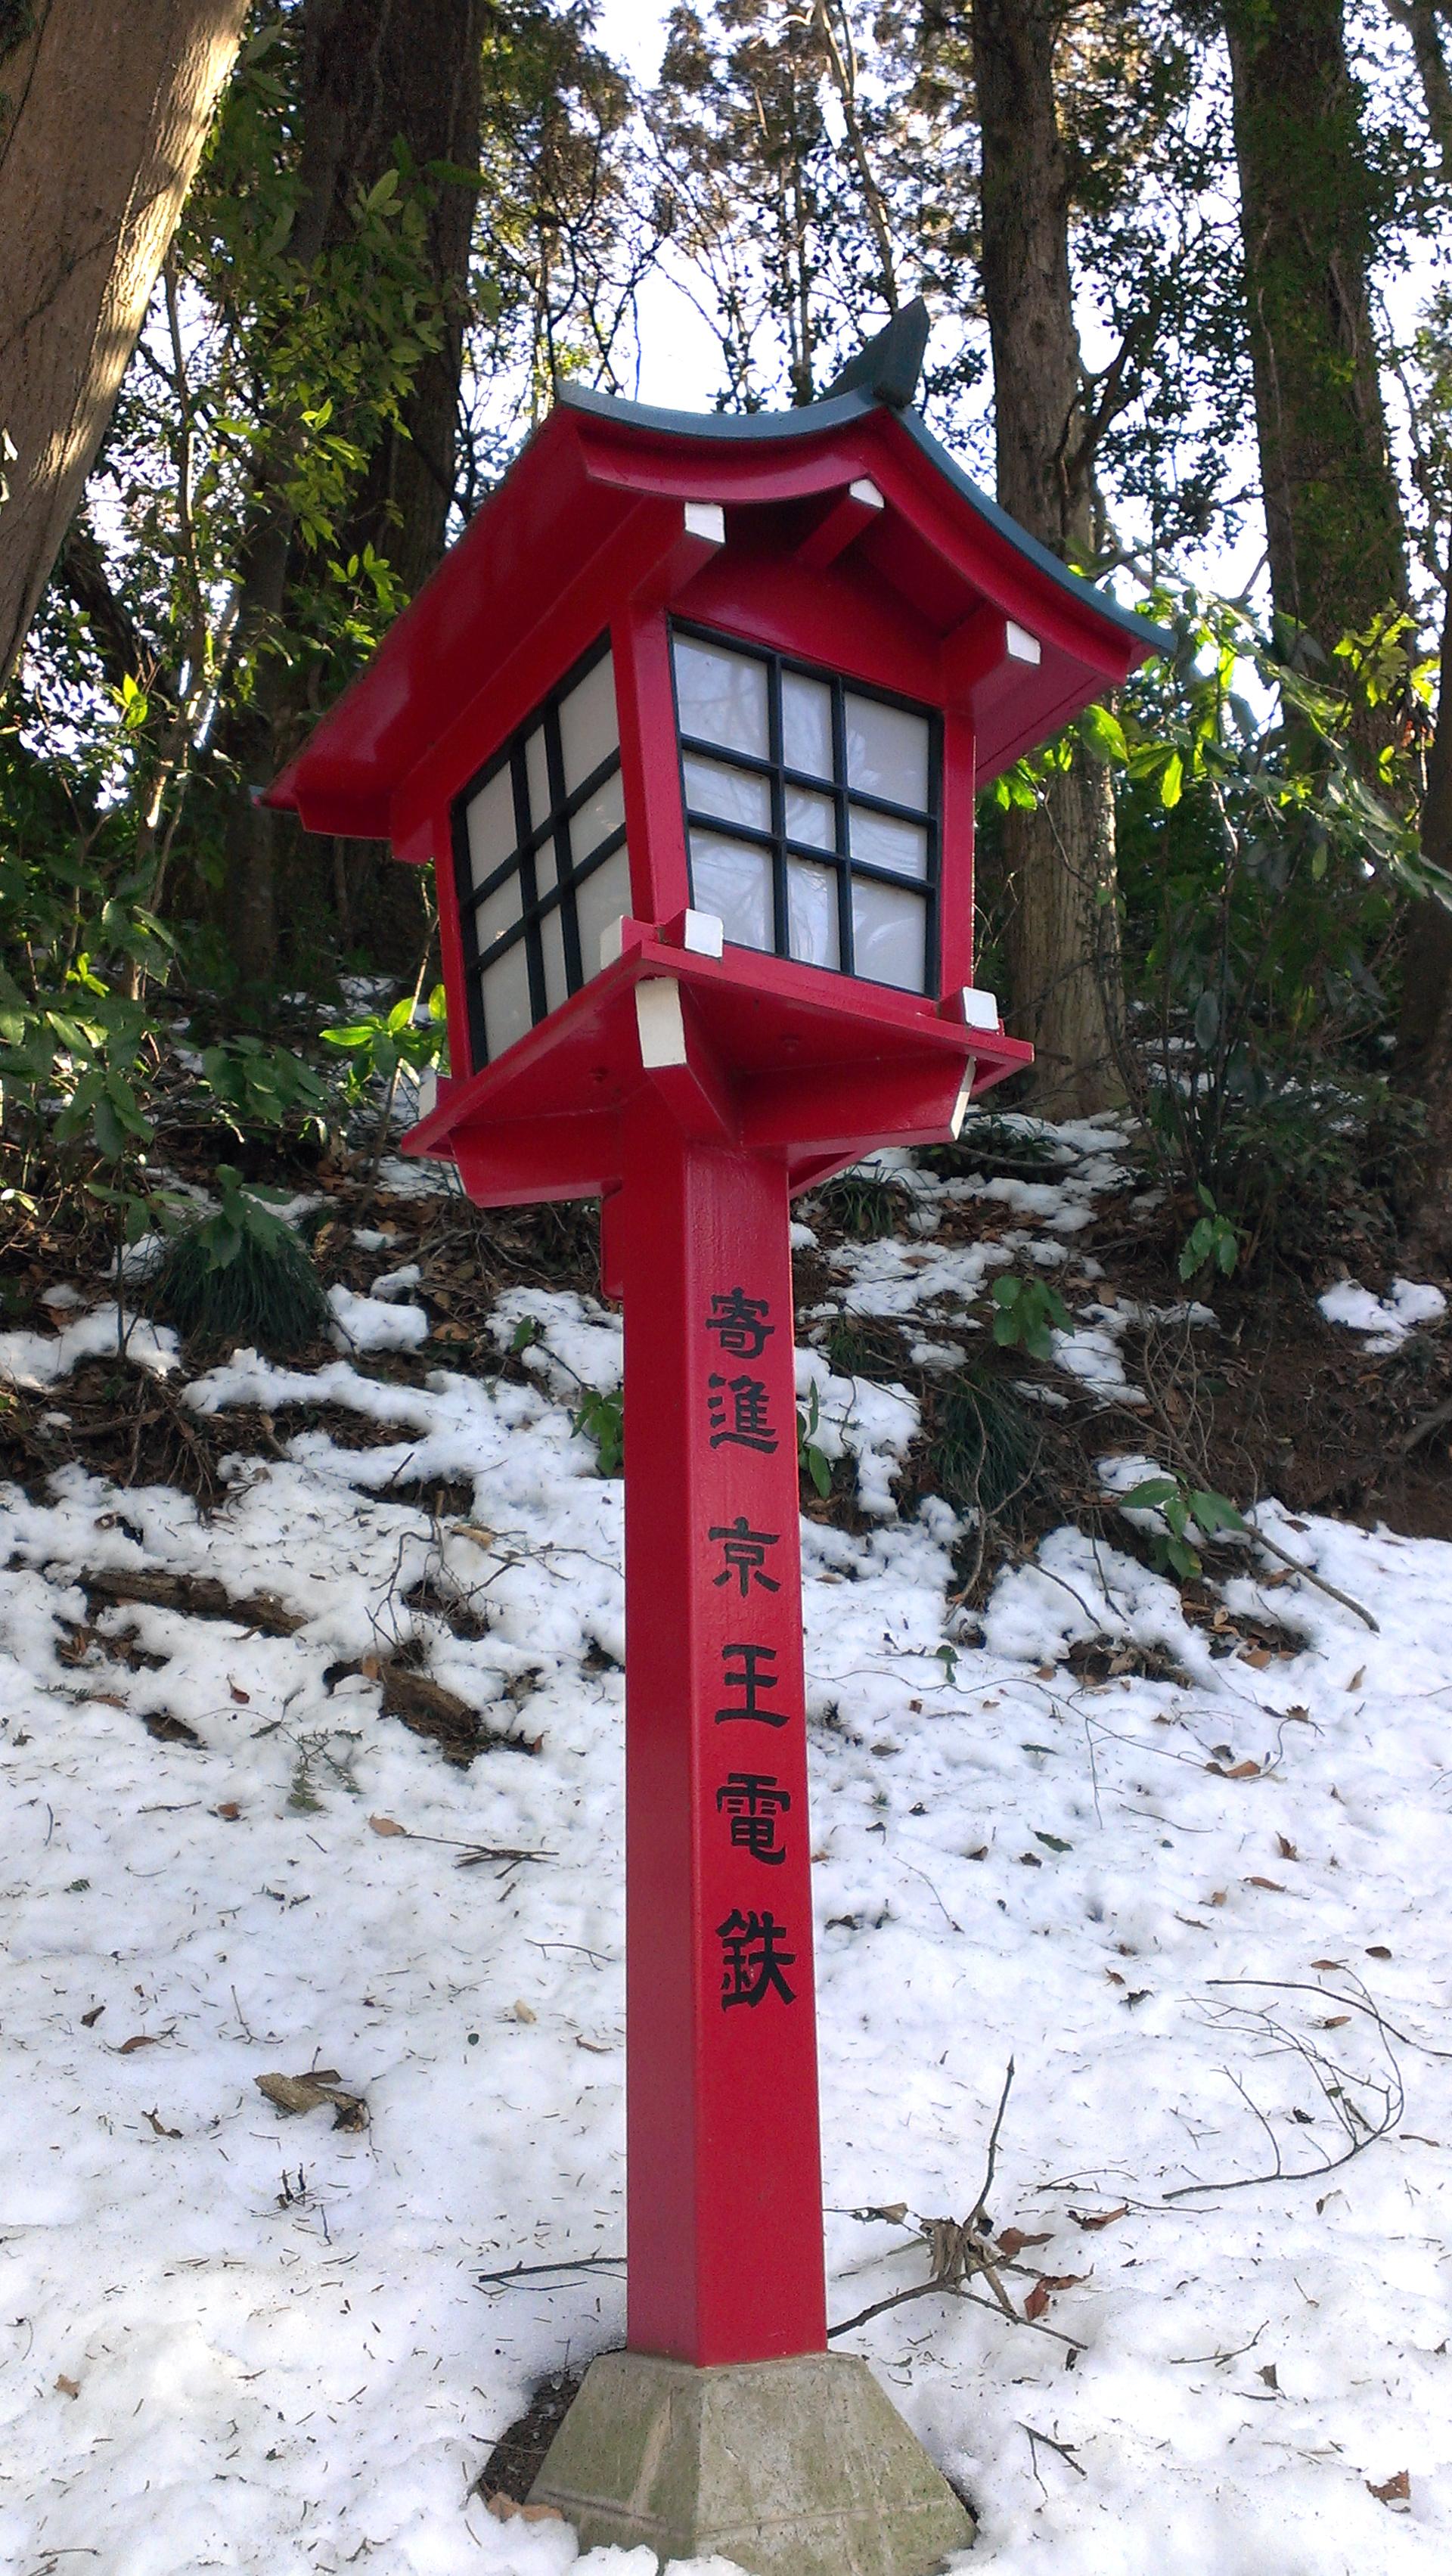 Mount-Takao-lamp